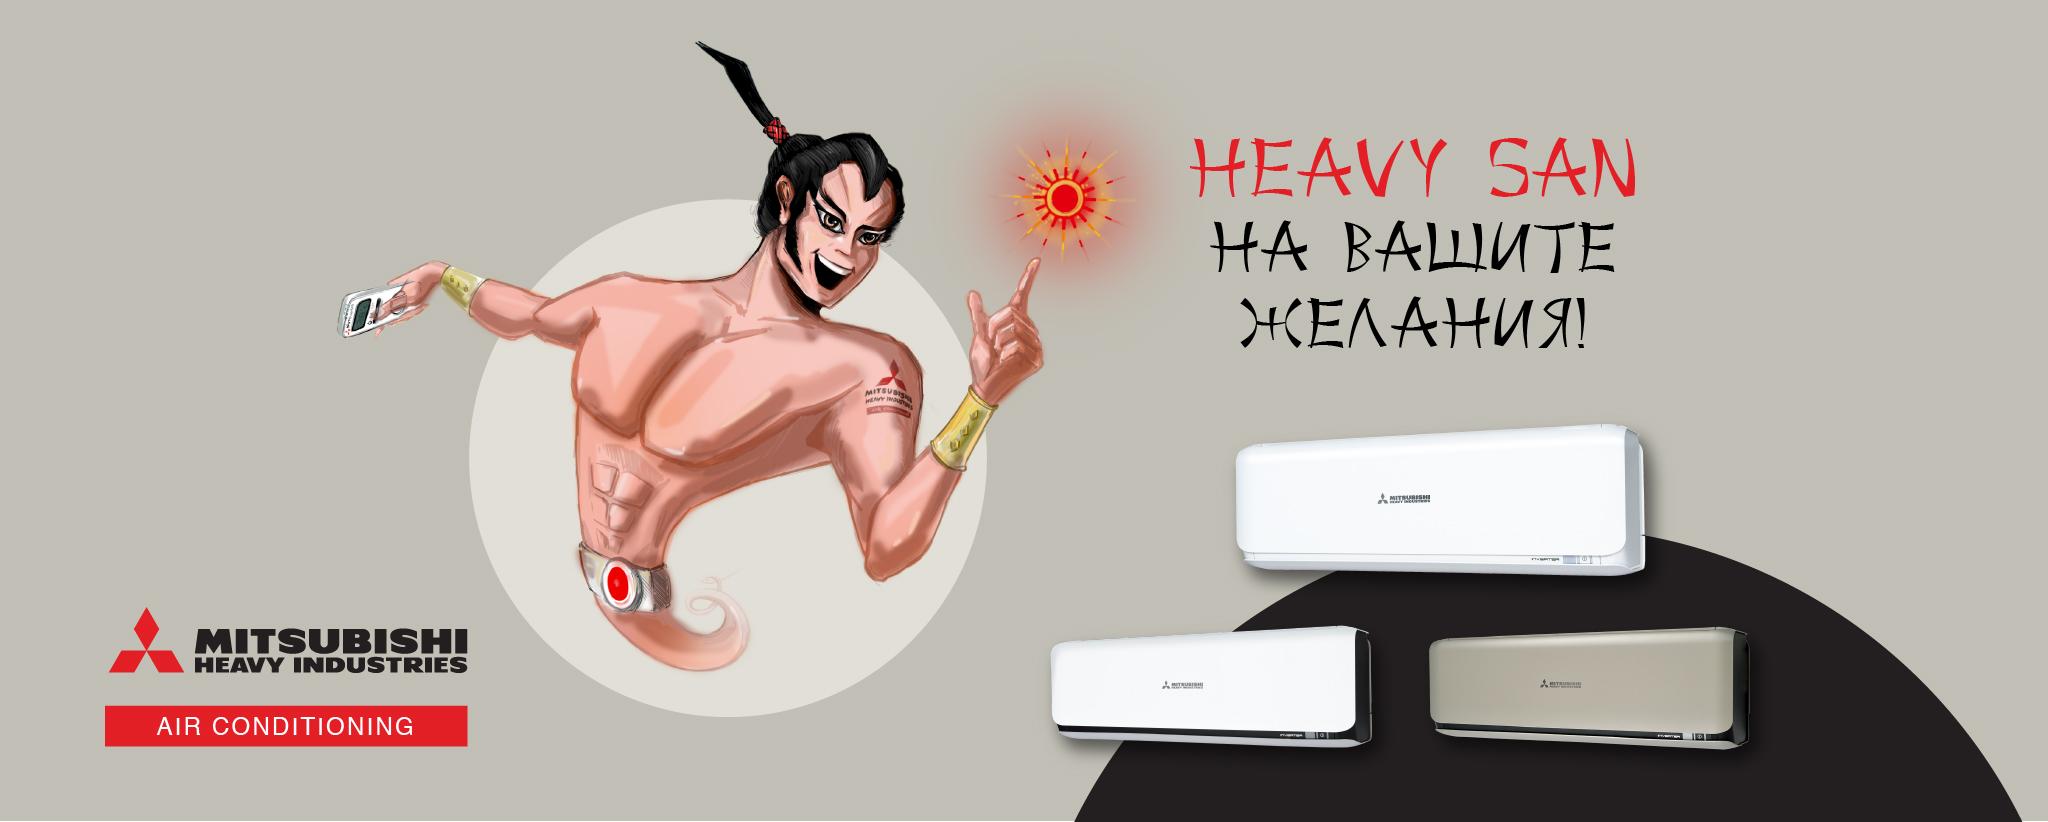 Heavy San, духът heavy san, CONDEX, Mitsubishi Heavy Industries, климатии, климатици Mitsubishi Heavy Industries, Heavy San